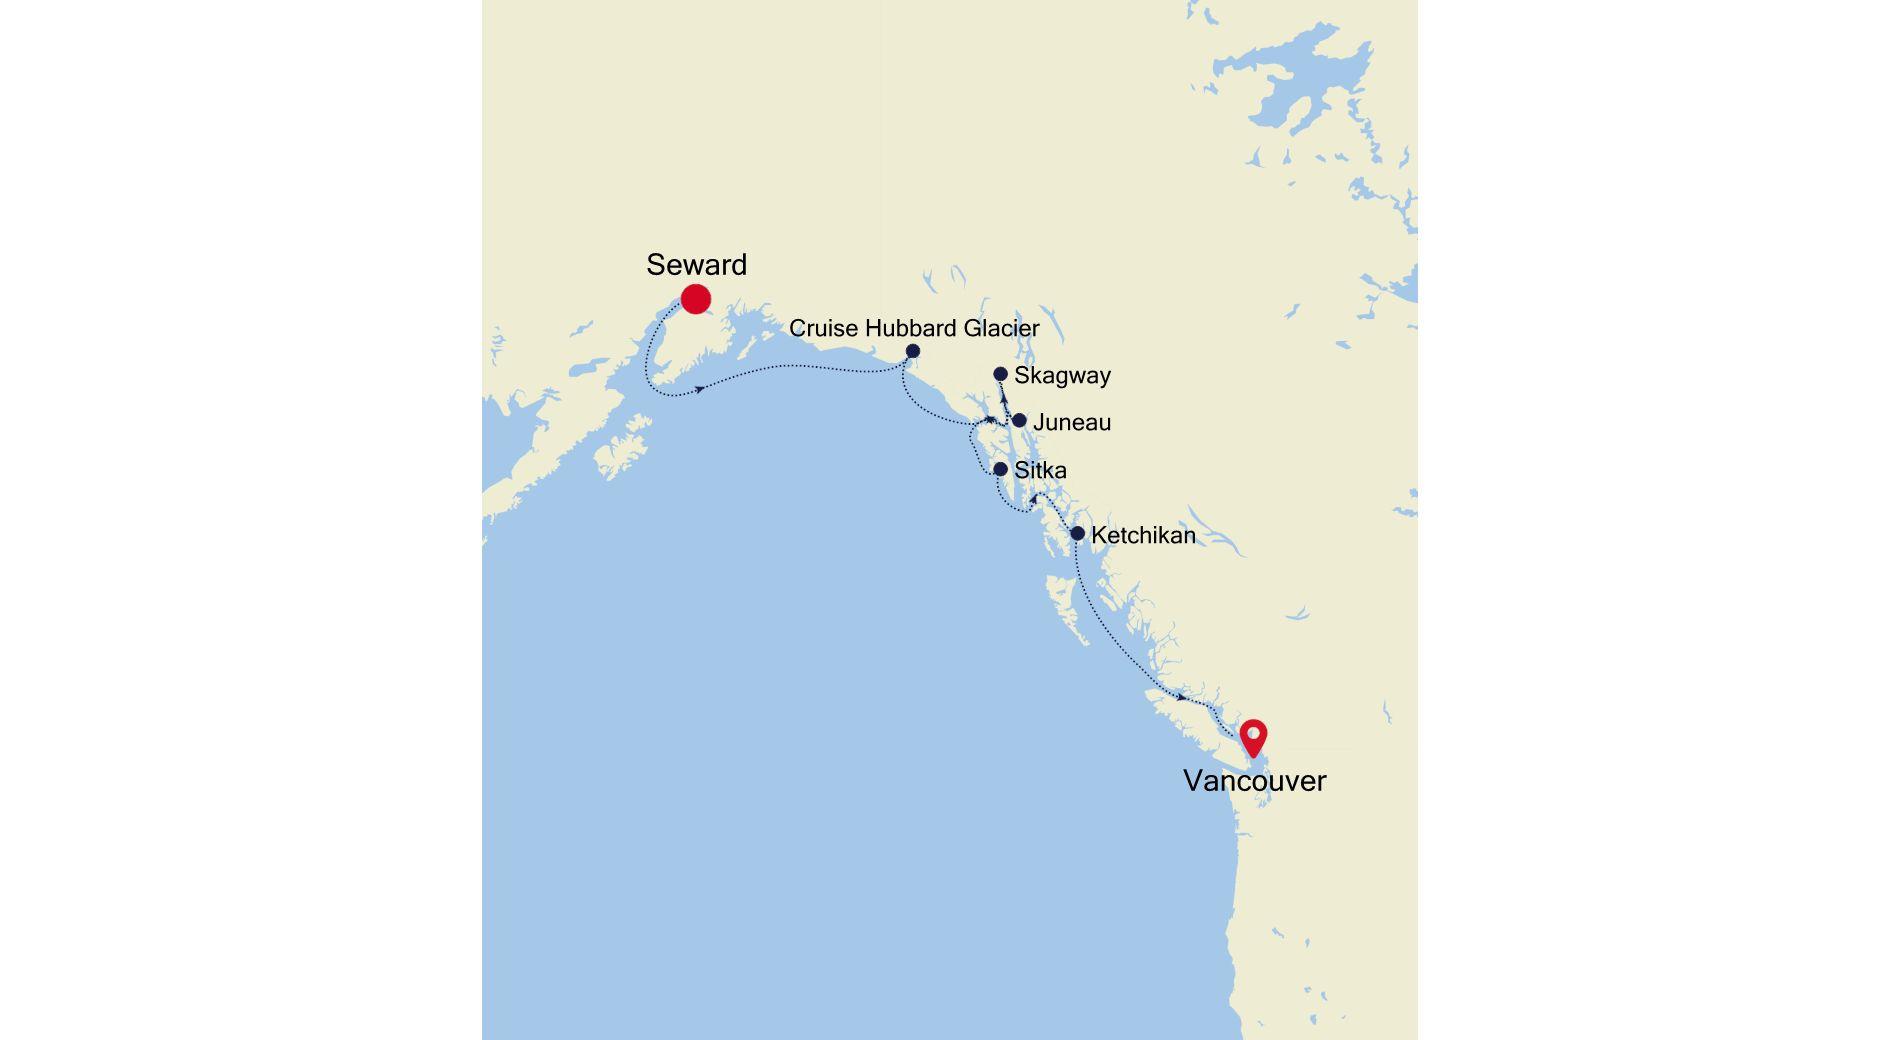 6923 - Seward nach Vancouver